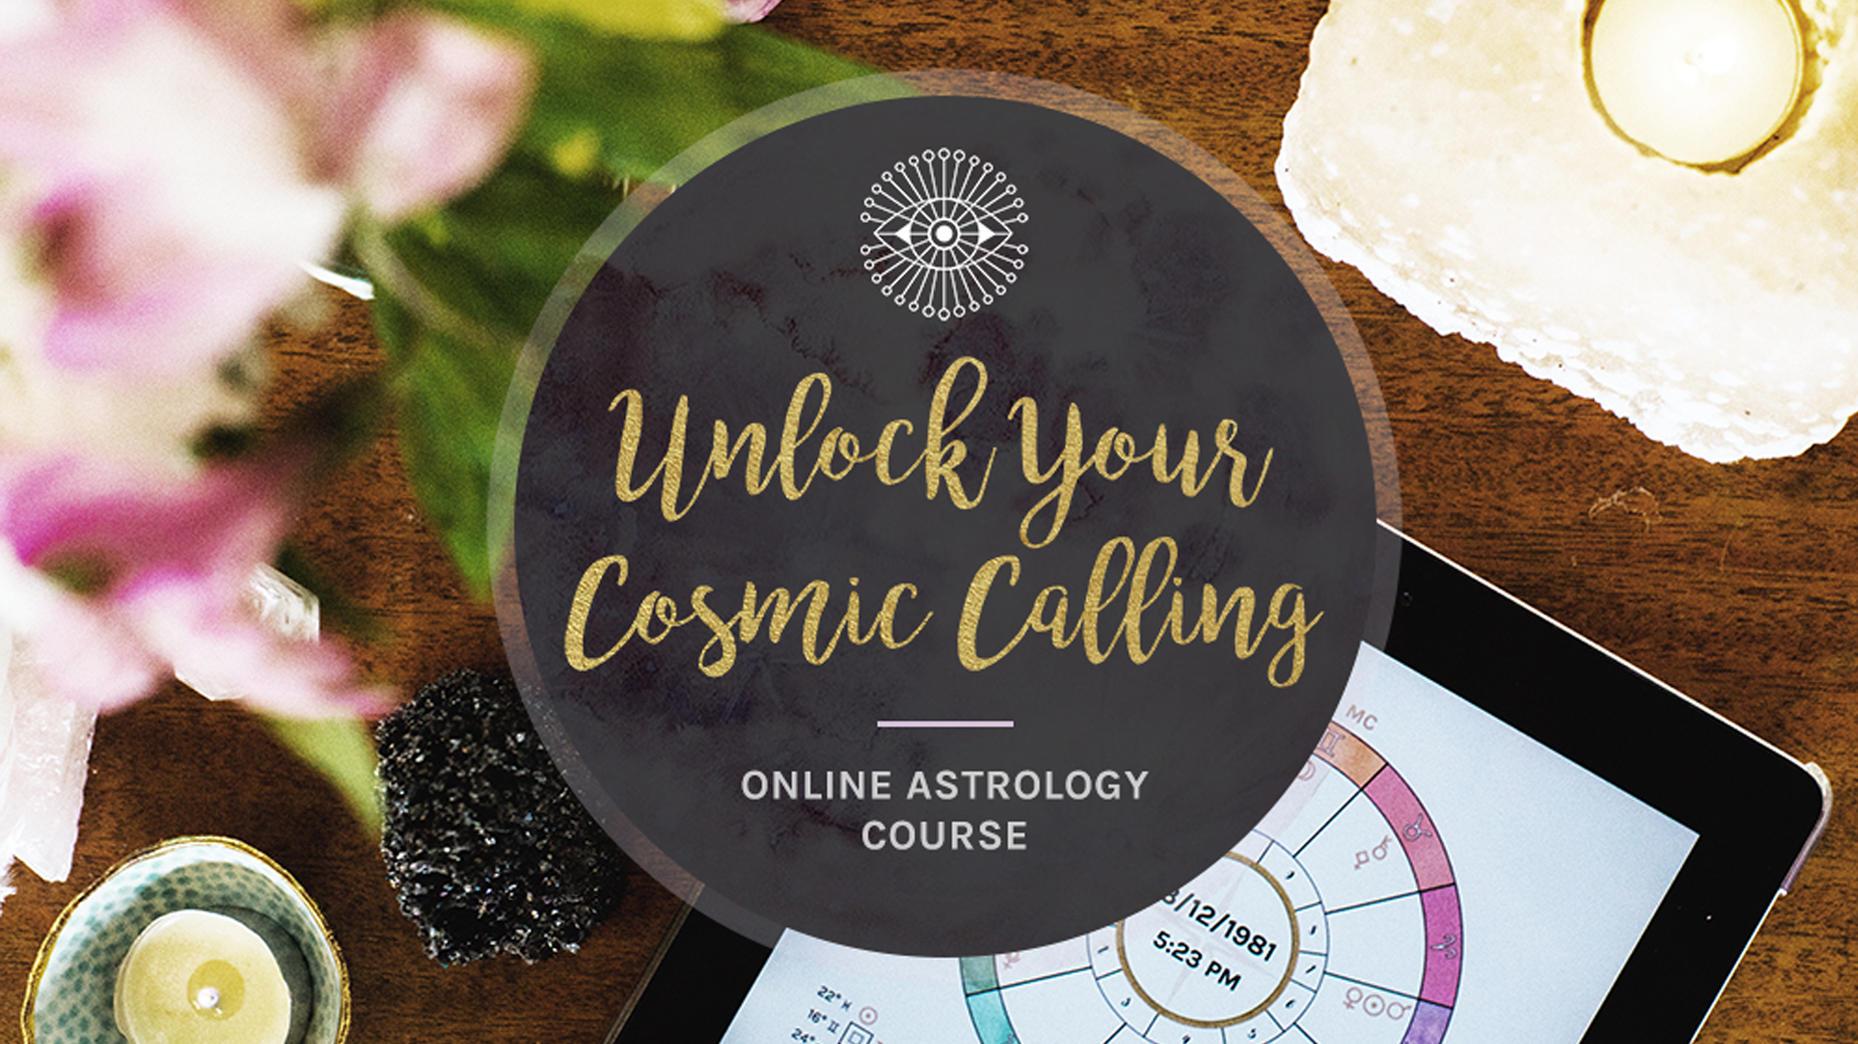 sites/18290/video/KKPE7QtRqGcm4hb0ktvk_Unlock_Your_Cosmic_Calling mp4